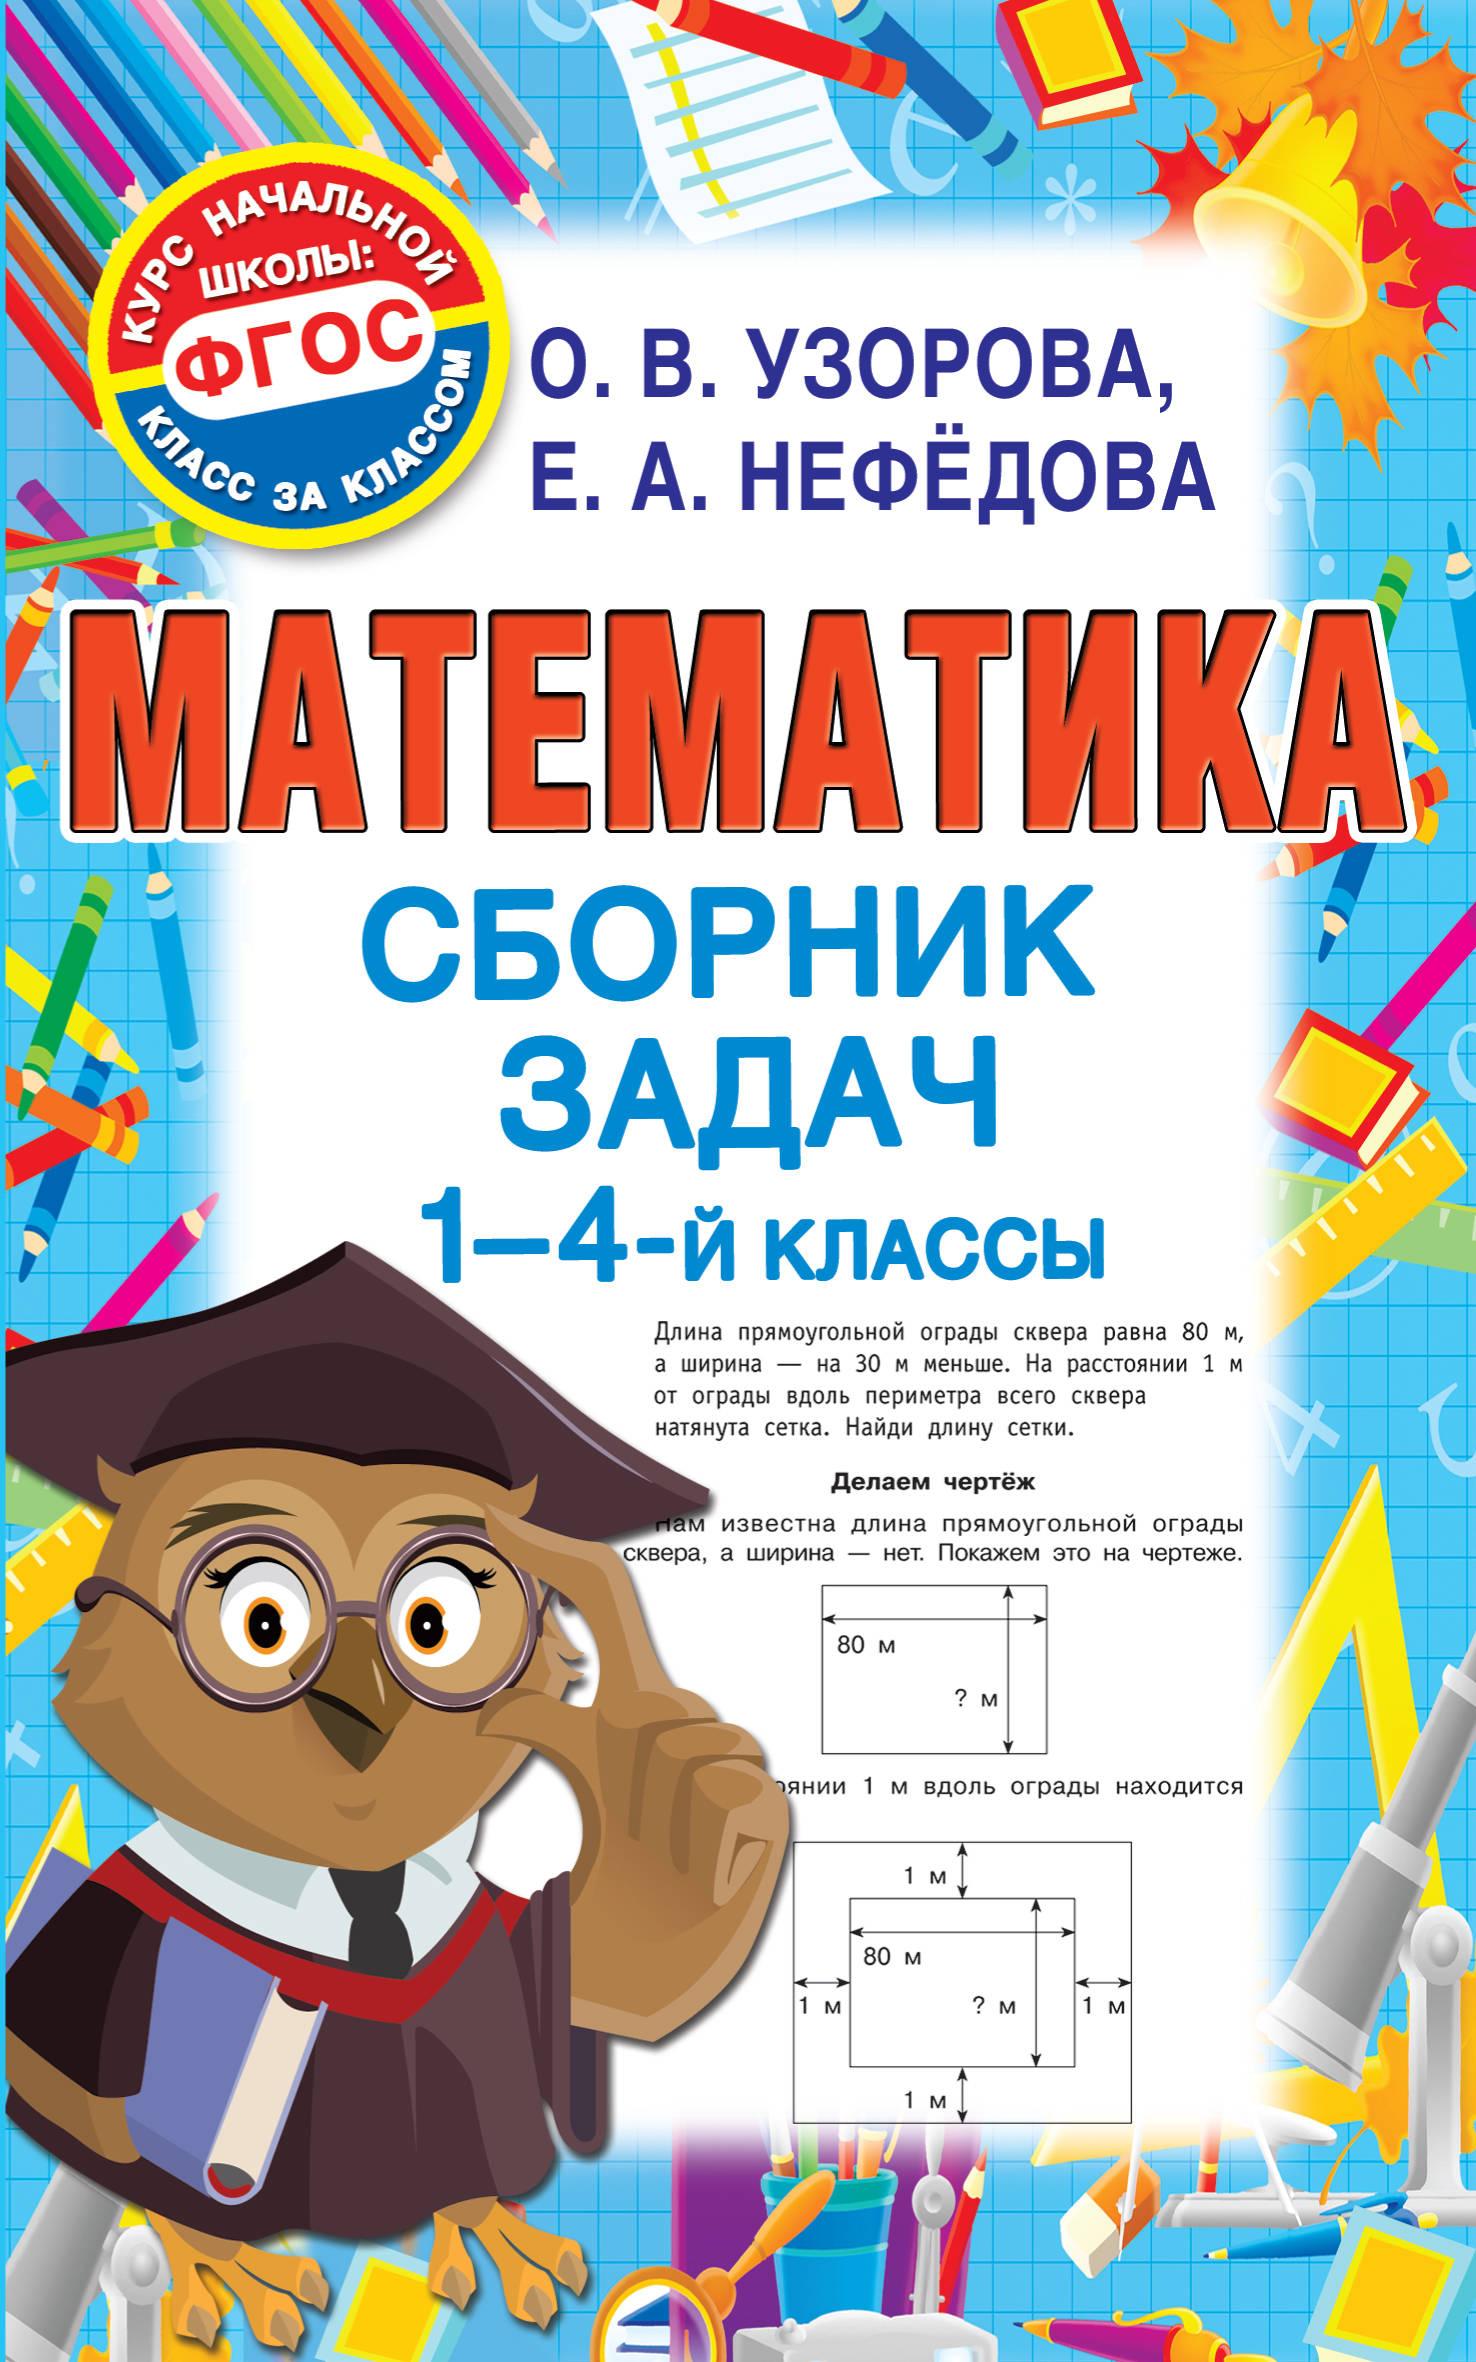 О. В. Узорова, Е. А. Нефёдова. Математика. 1-4 классы. Сборник задач